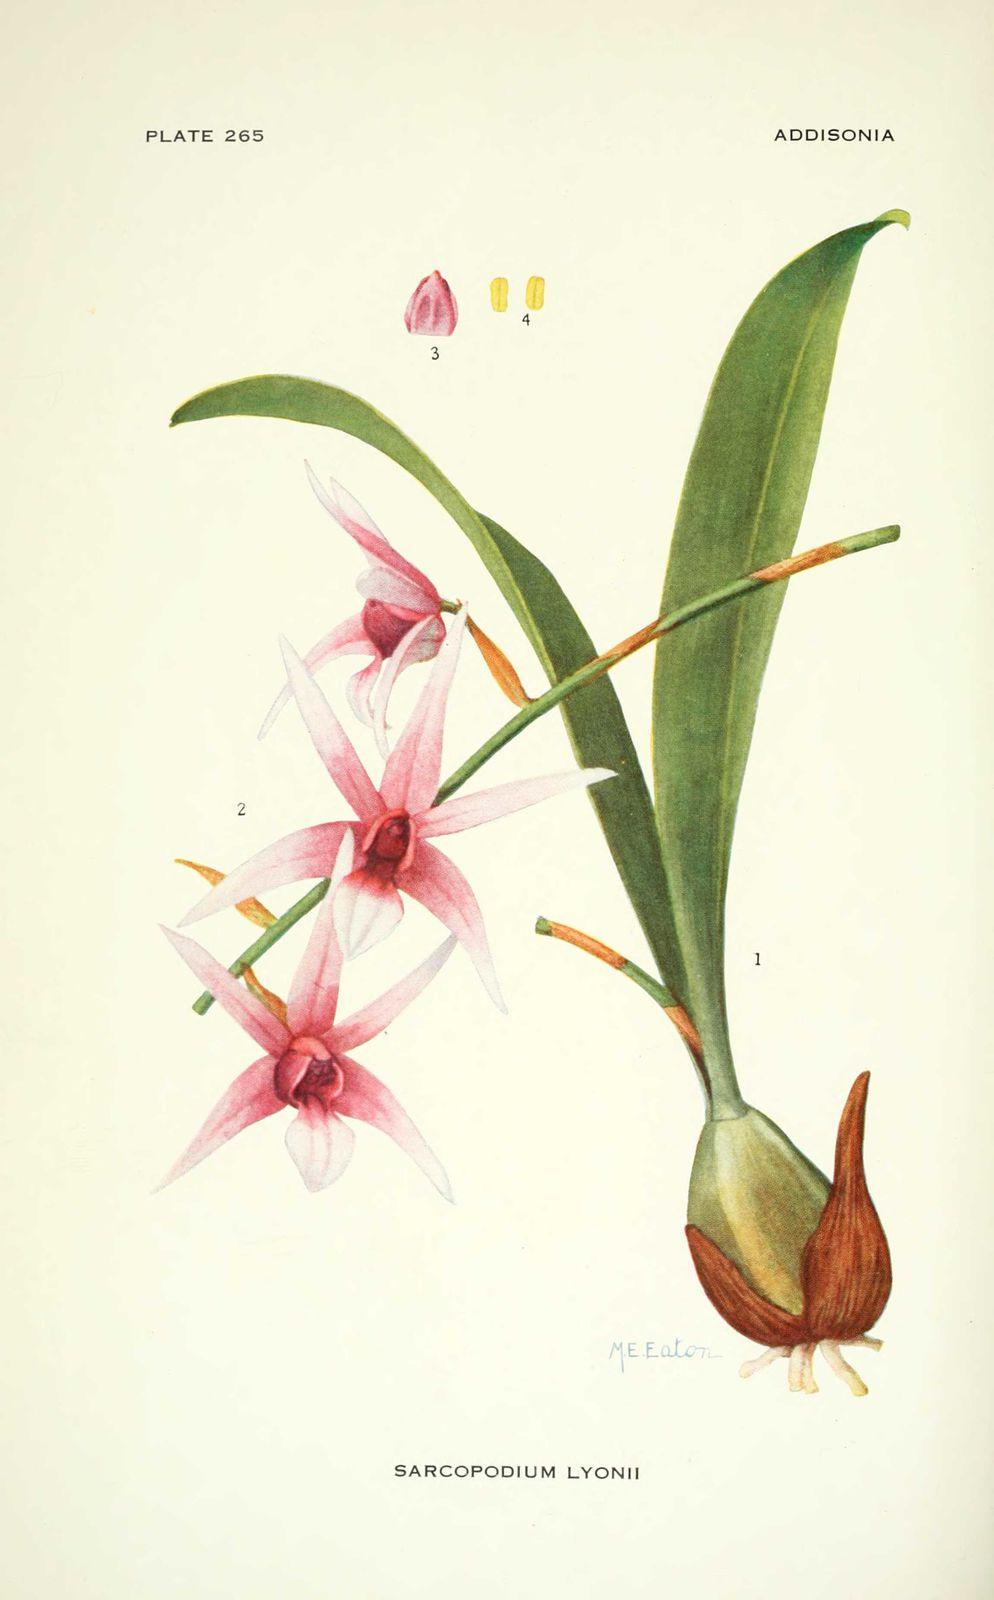 gravure fleur sarcopodium lyonii (orchidee)